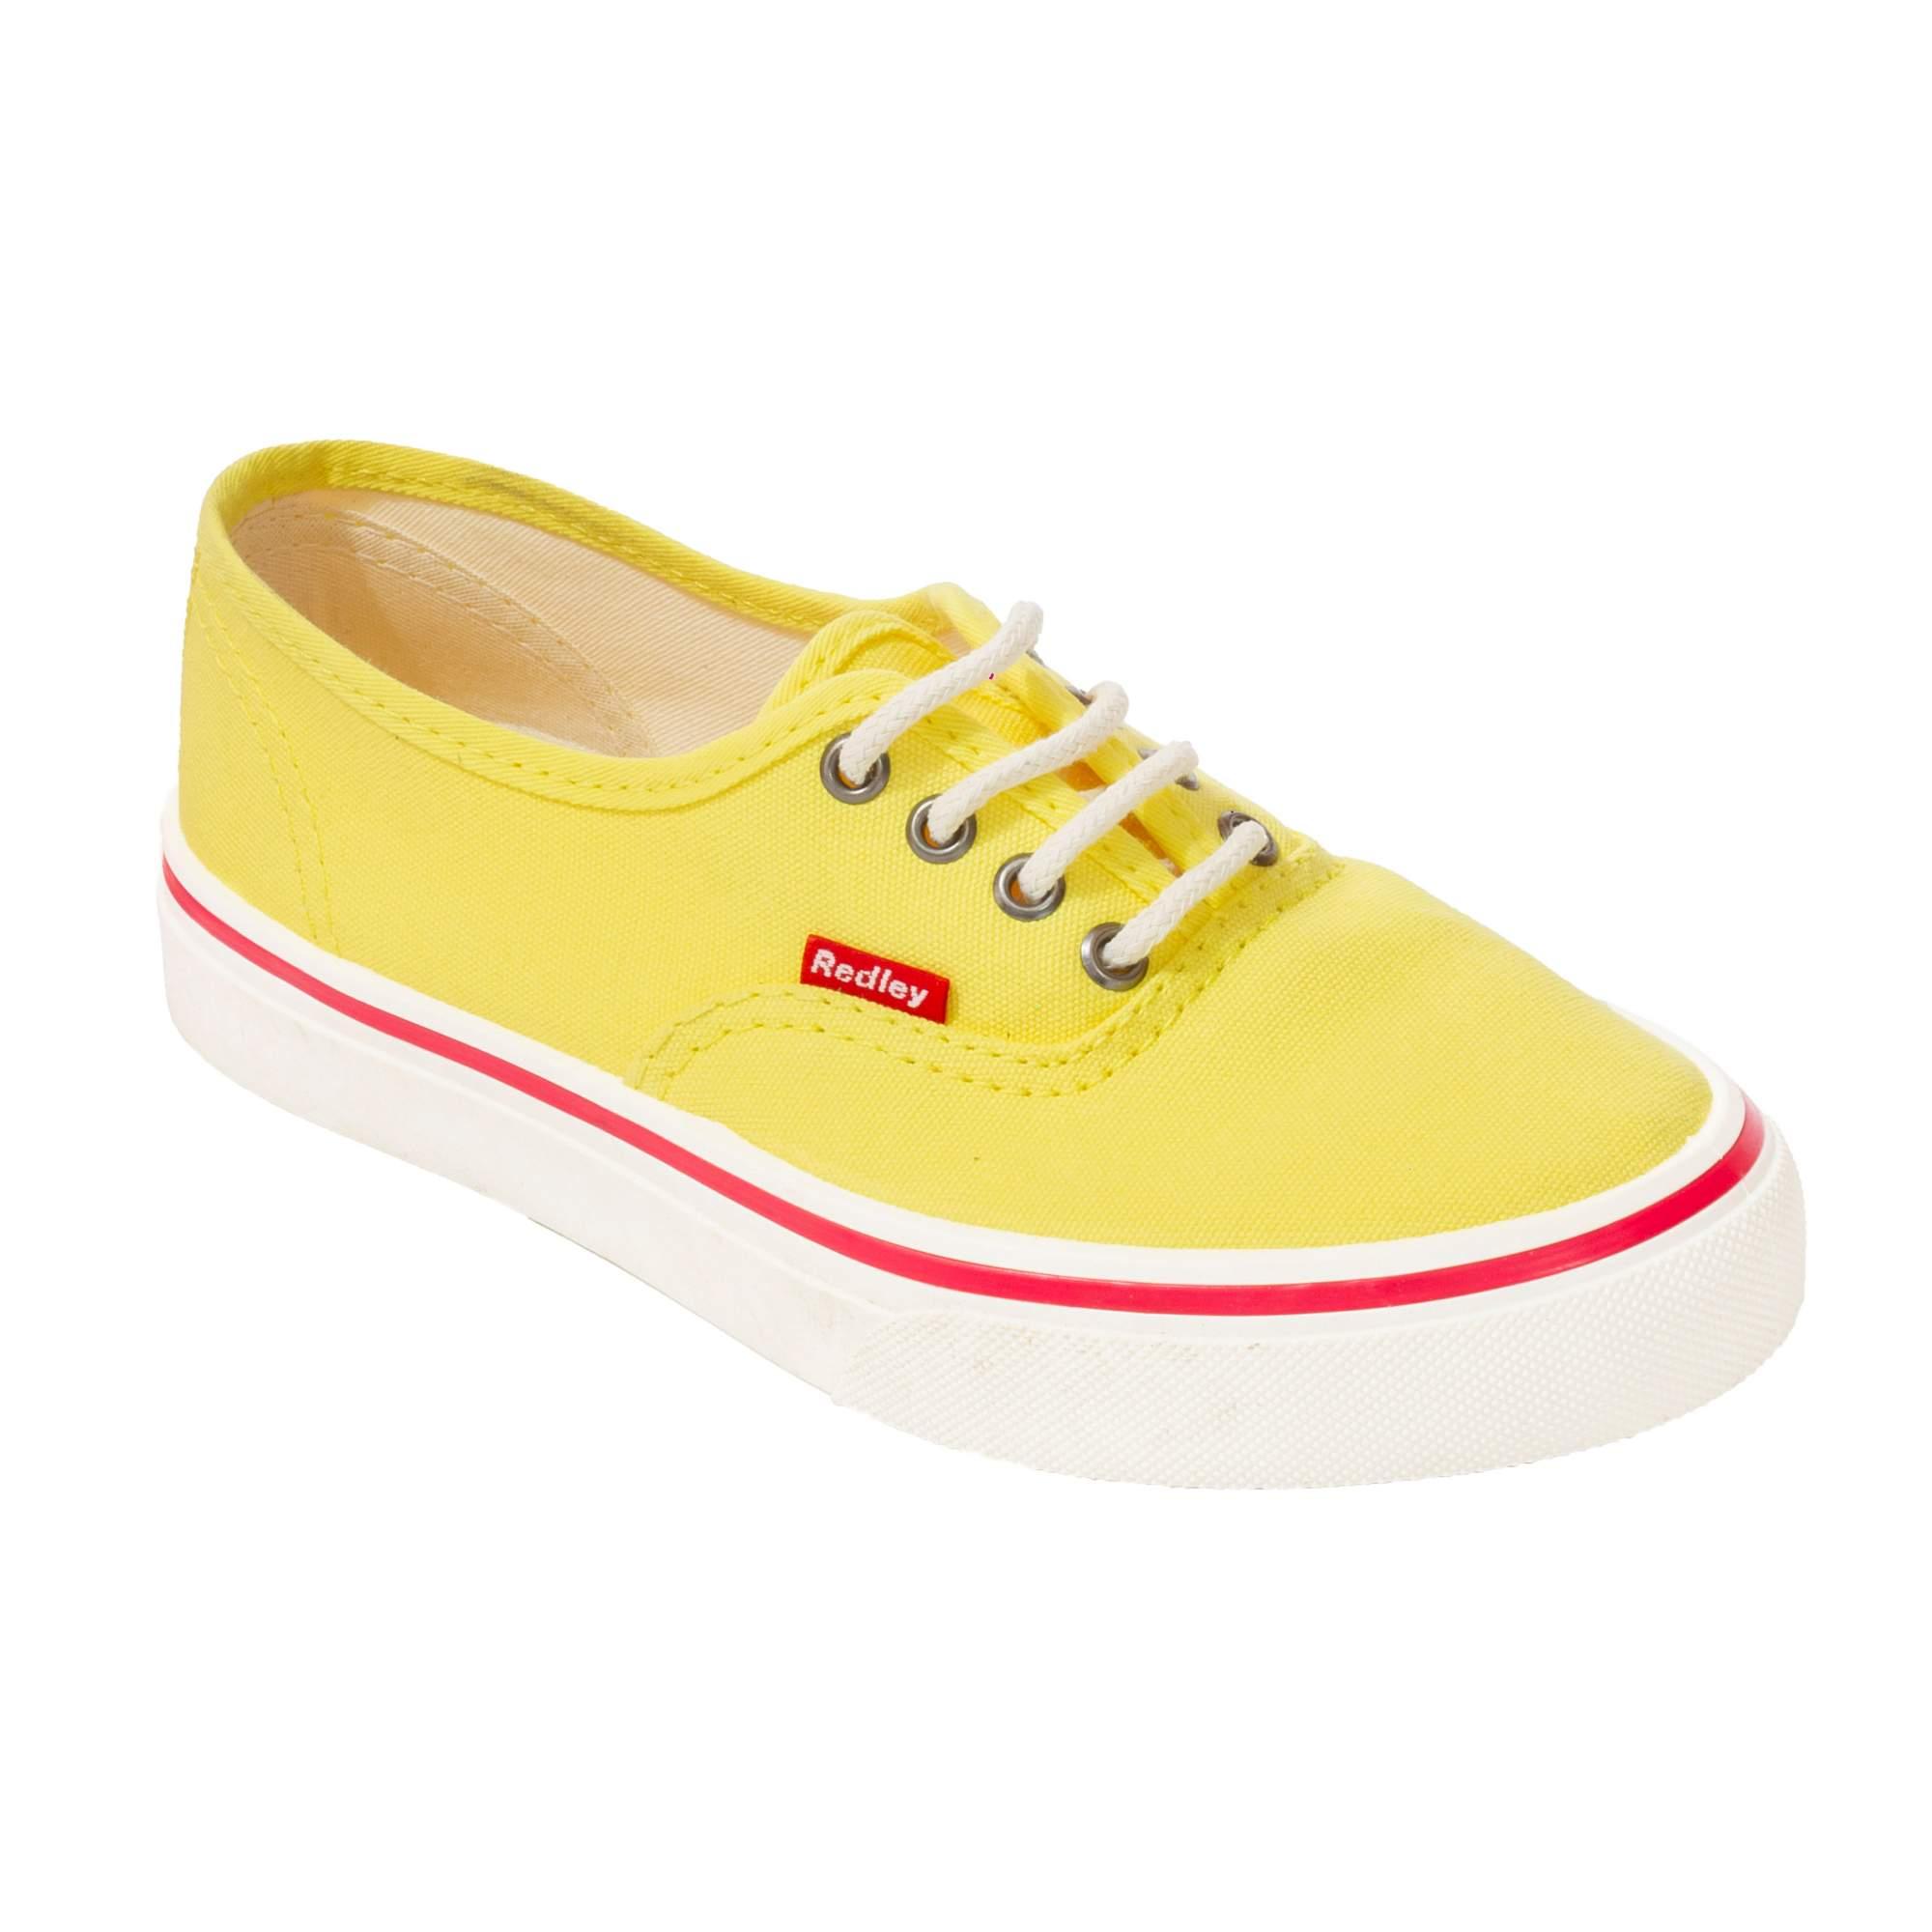 Tênis Redley Superbásico Amarelo